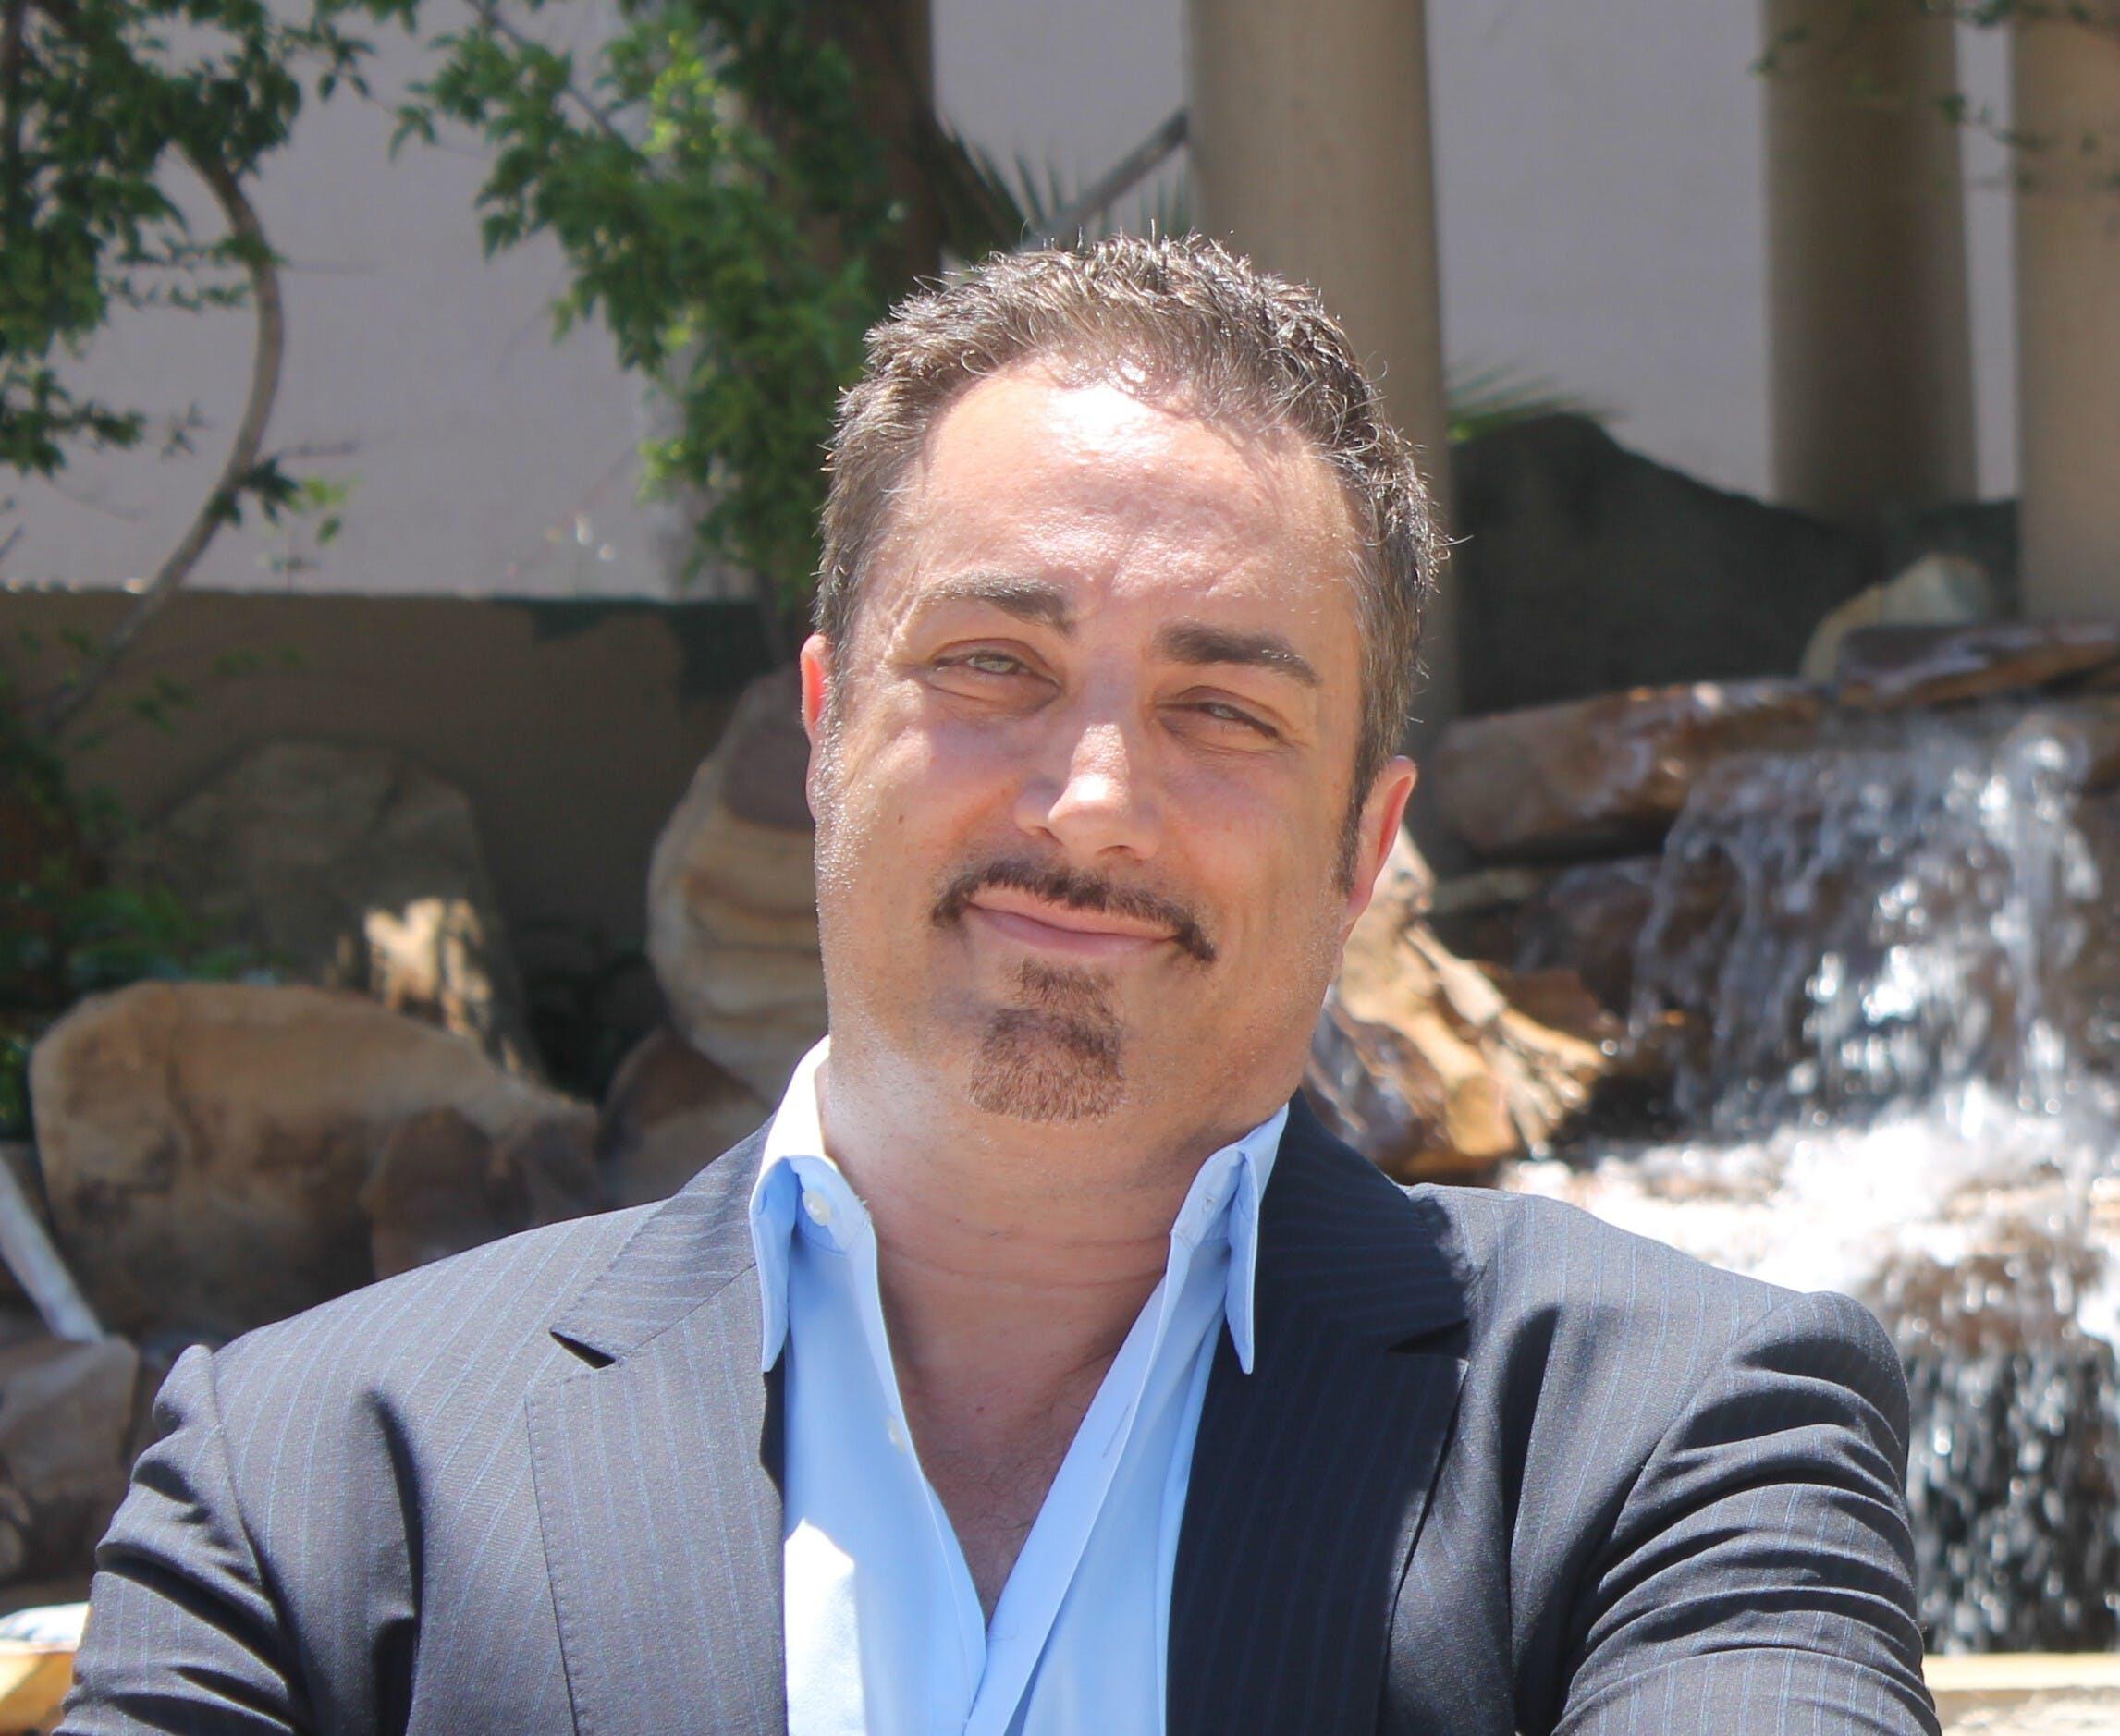 Dr. Louis Steven DeLuca